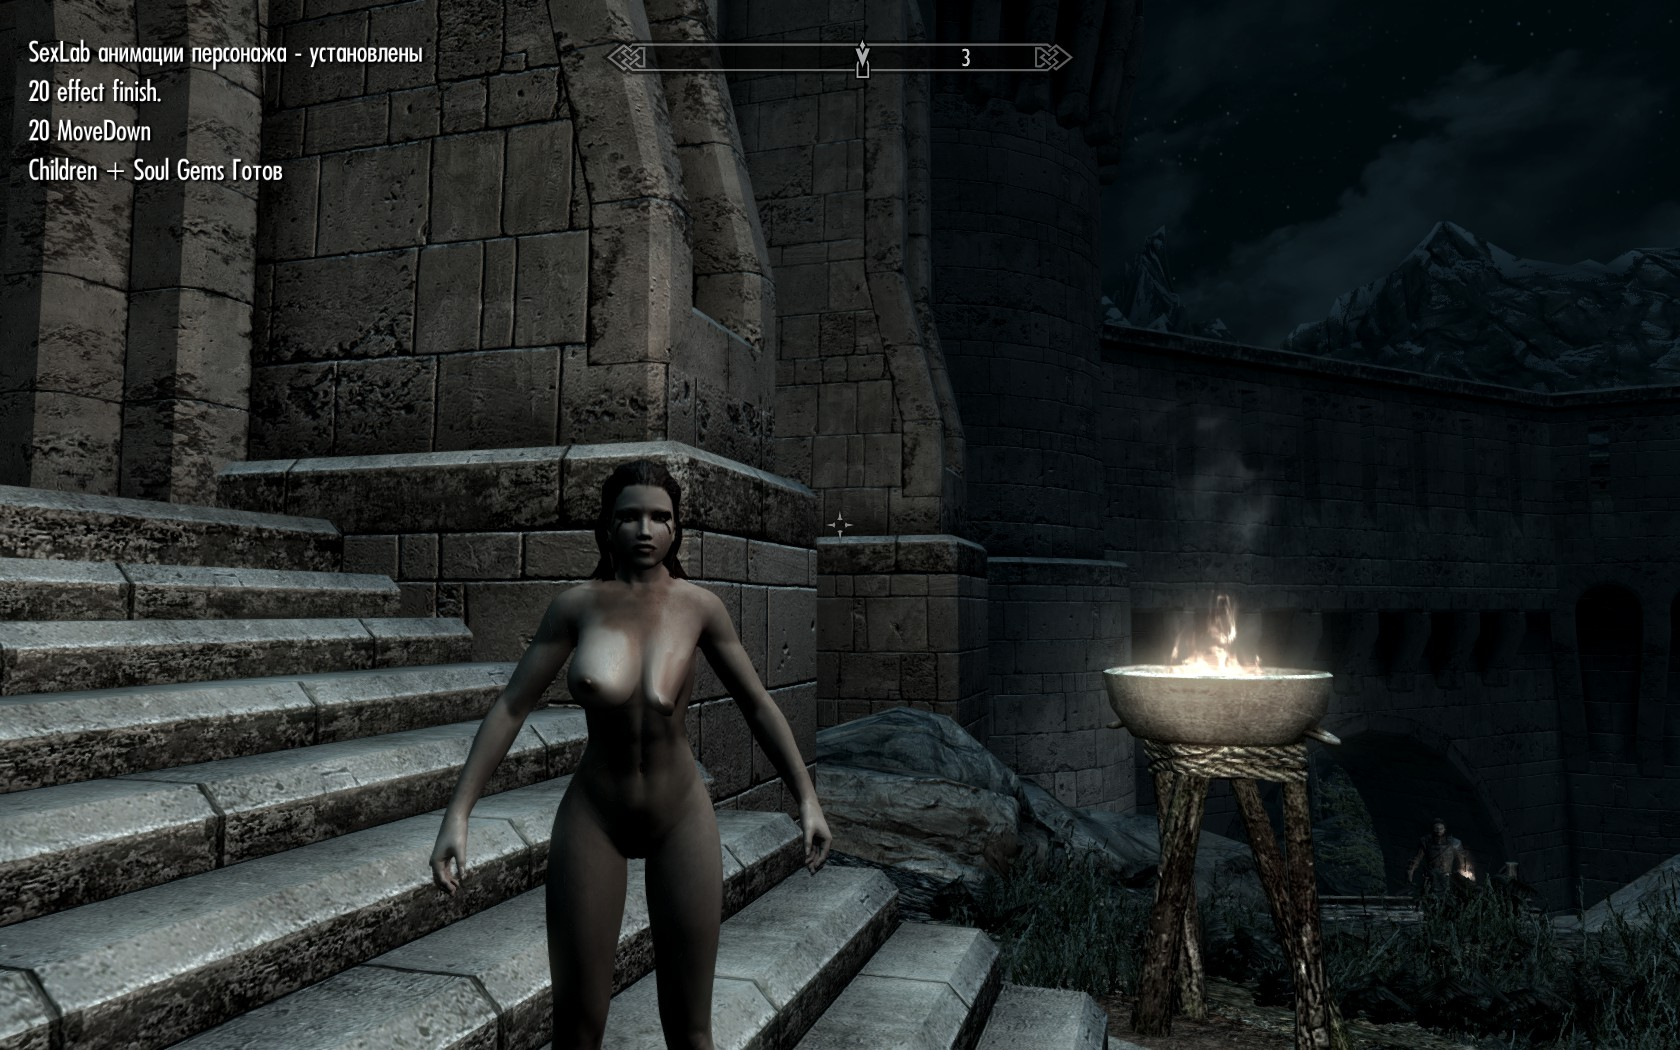 Мод на секс в игре скайрим видео